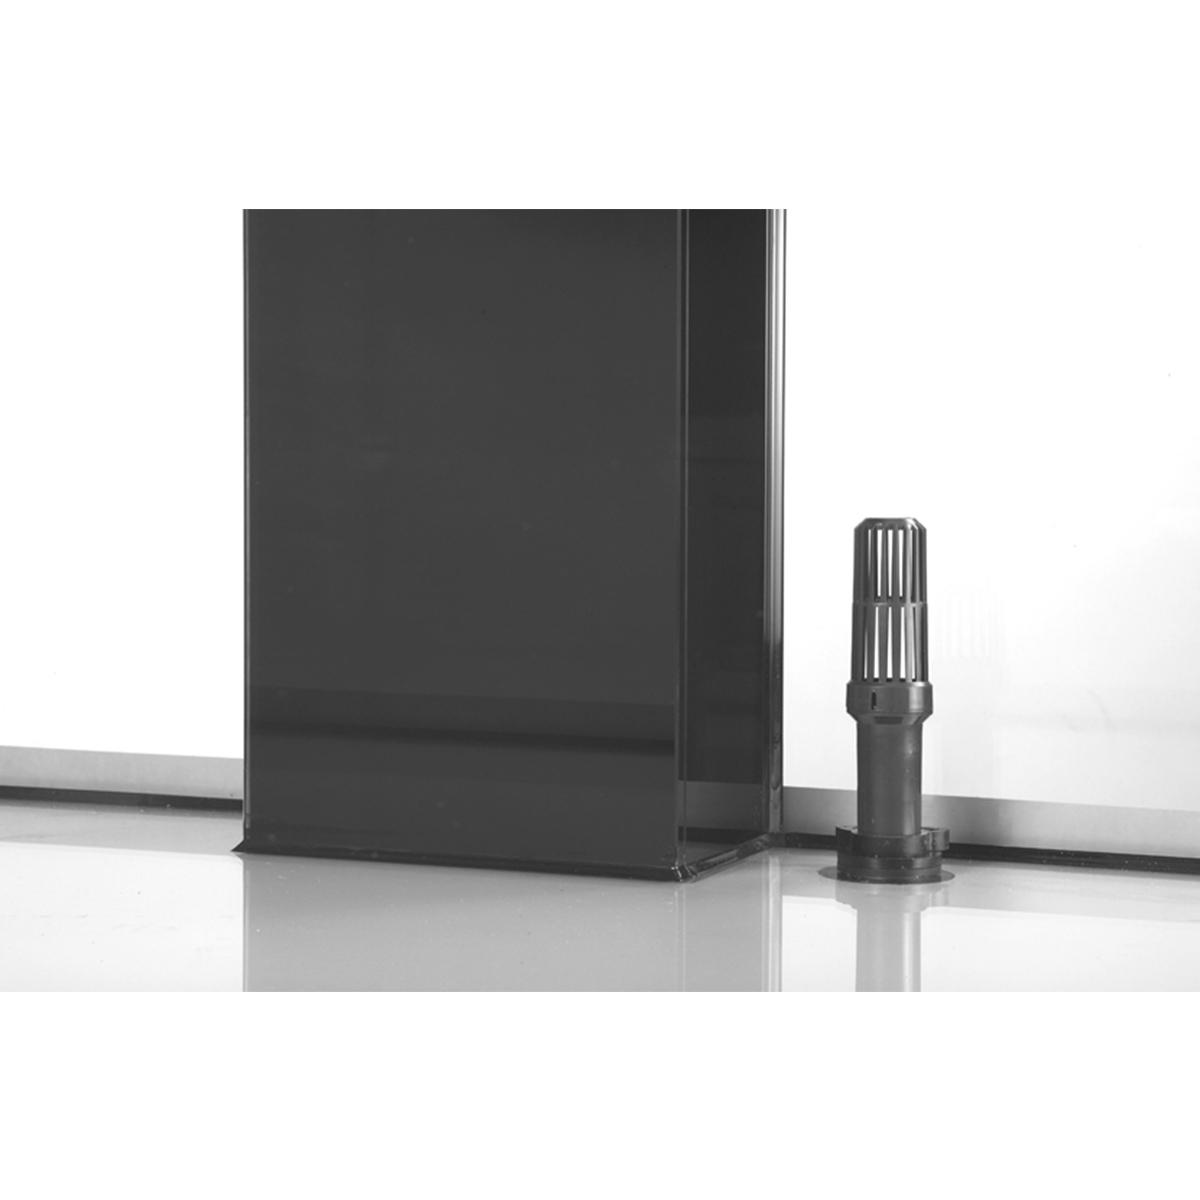 eheim incpiria 300 mit led beleuchtung kaufen bei zooroyal. Black Bedroom Furniture Sets. Home Design Ideas